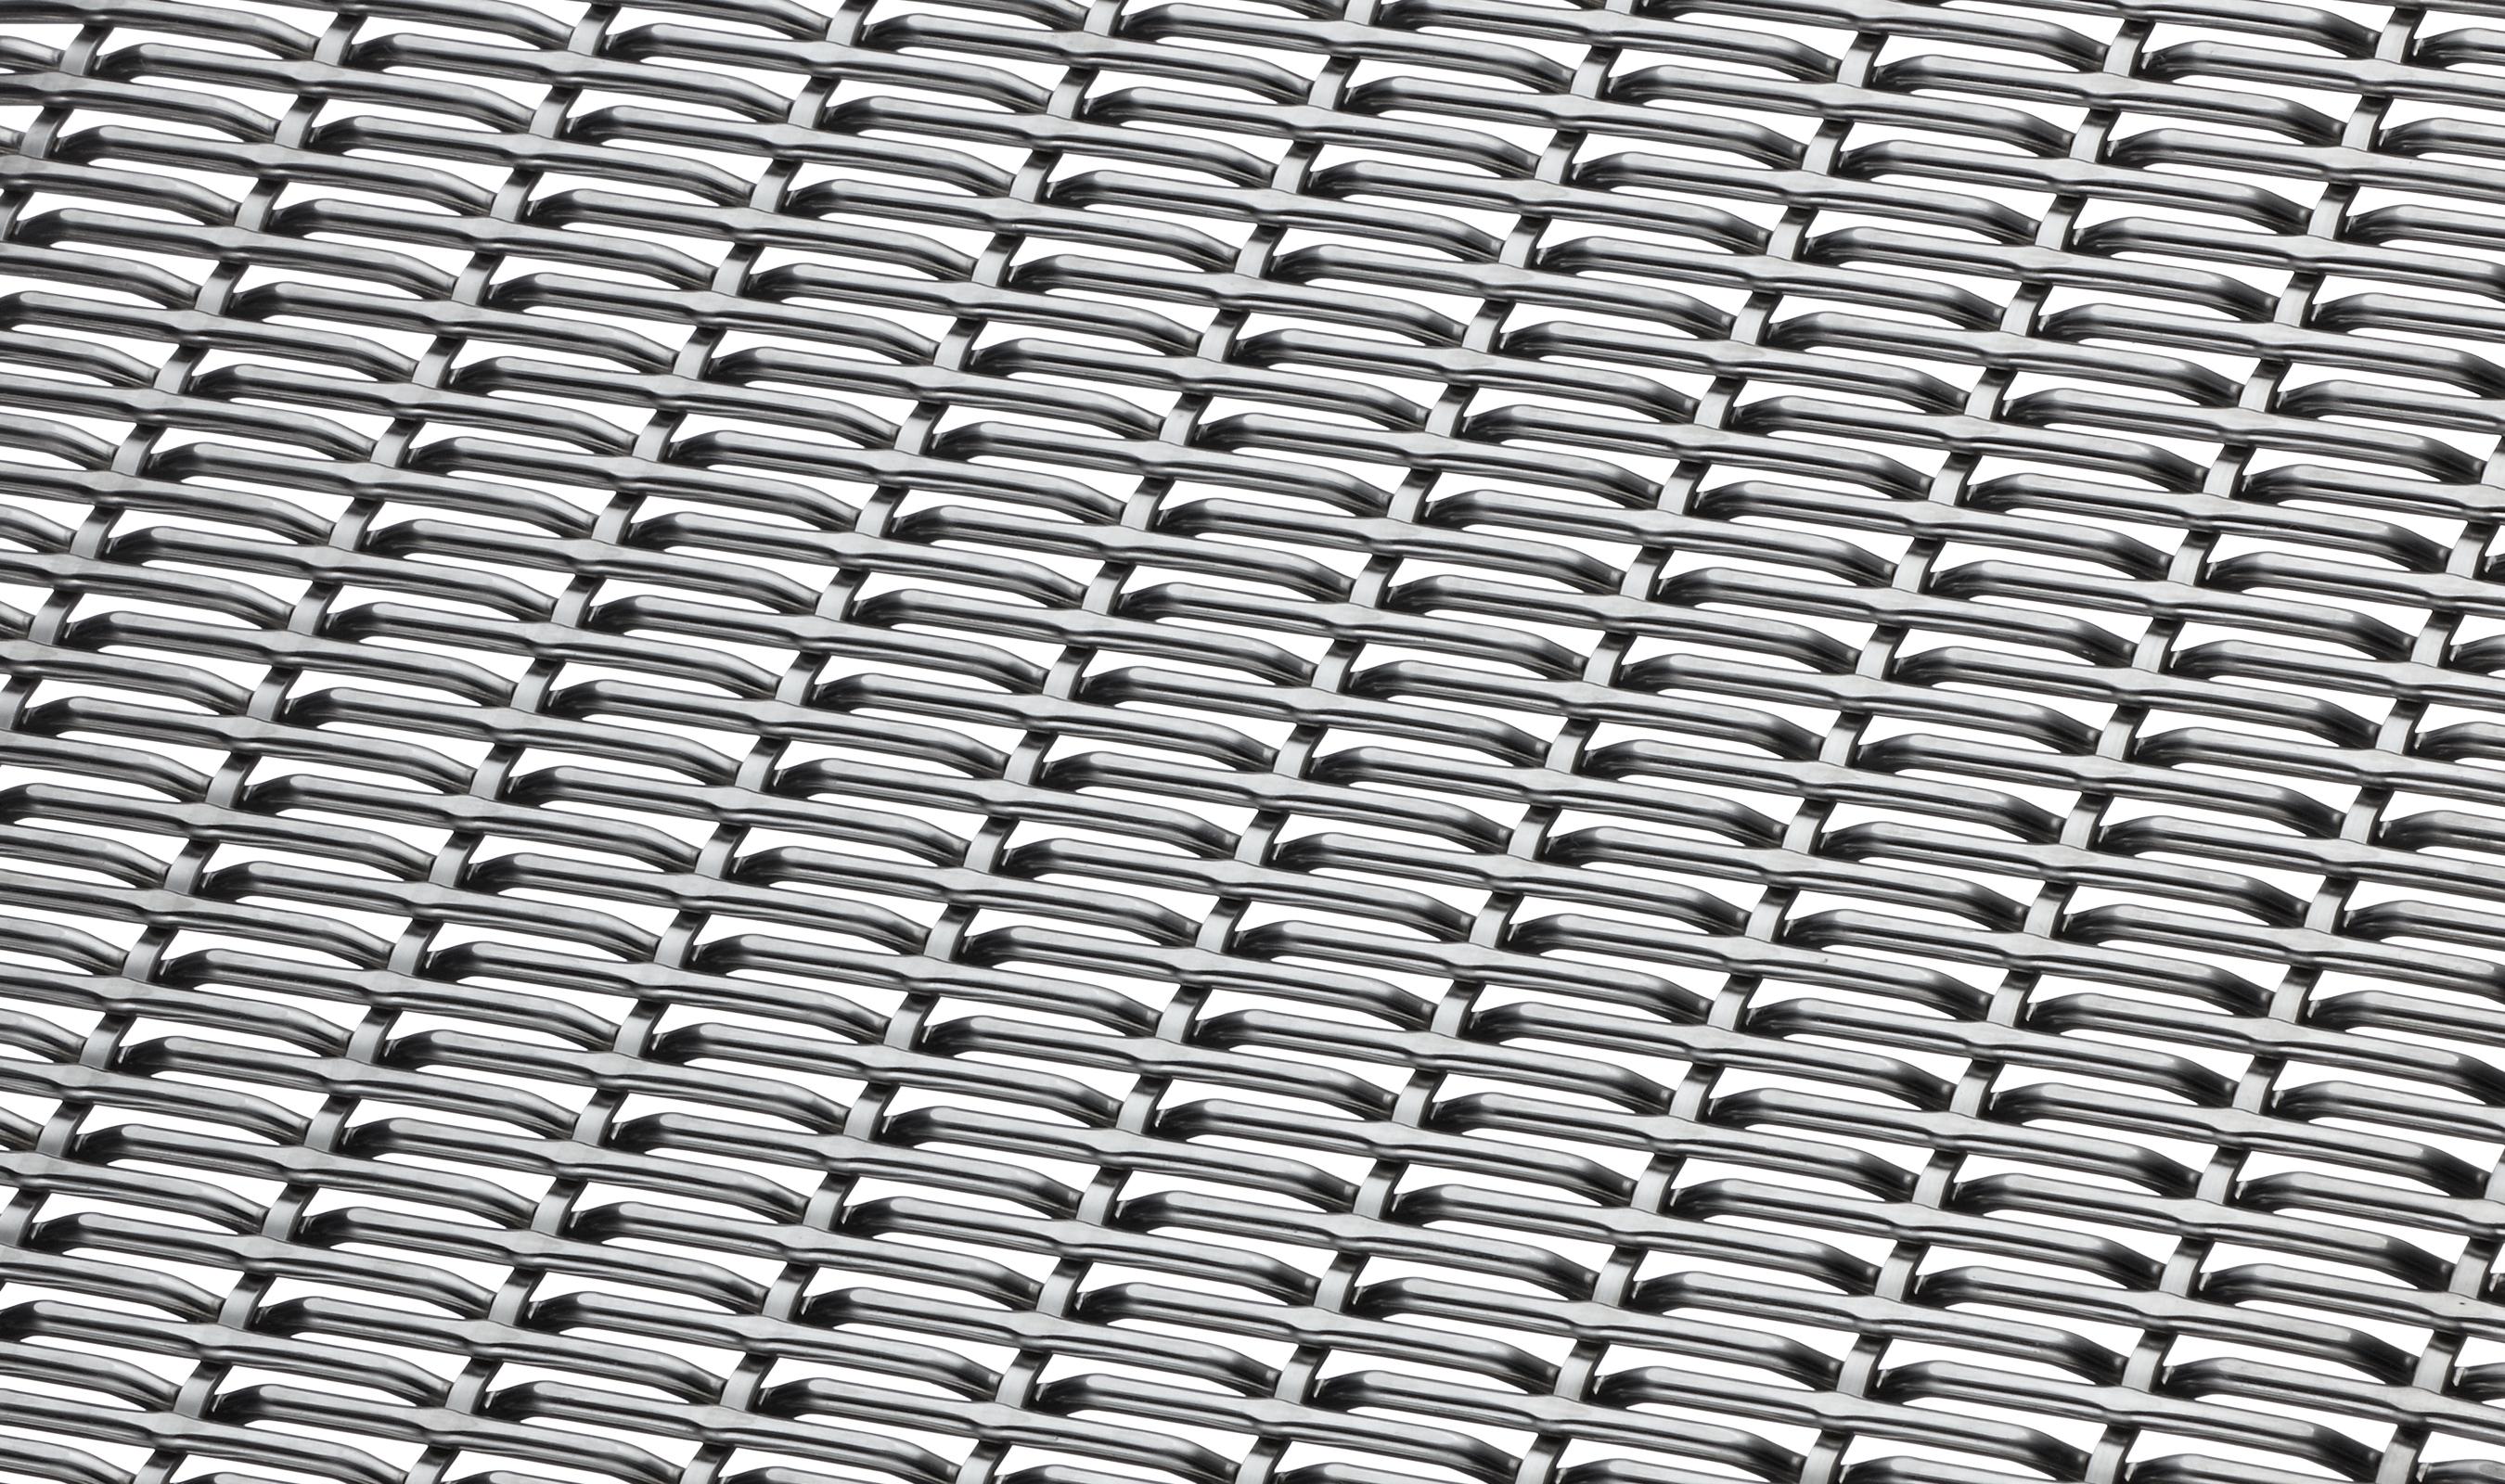 FSZ-1 Decorative wire mesh pattern in Stainless Steel